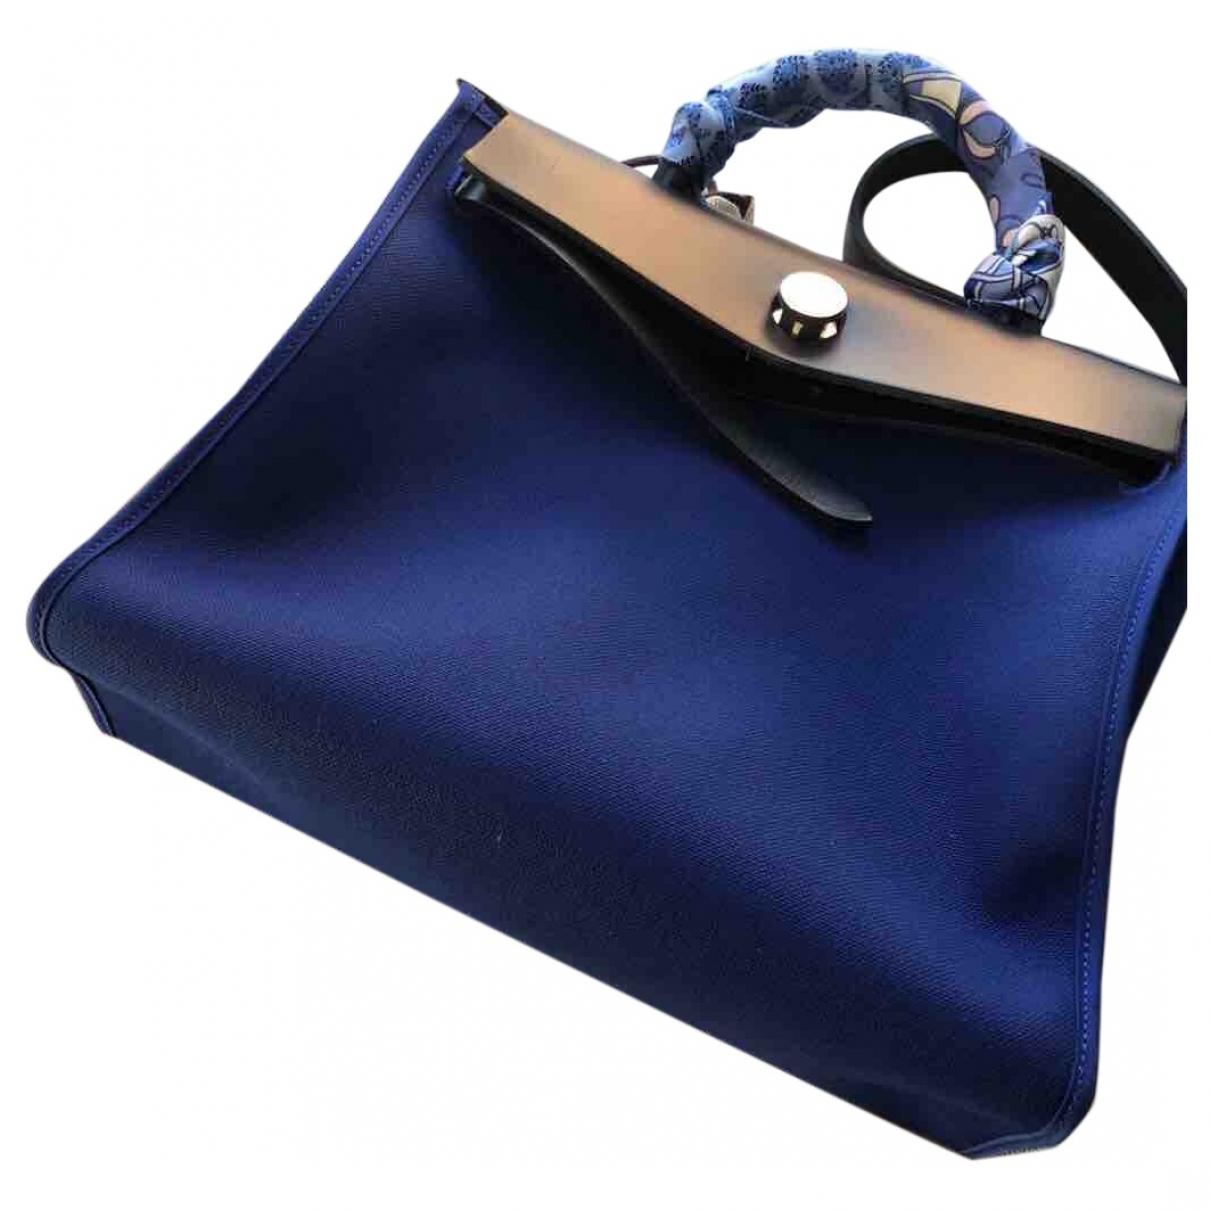 Hermes - Sac a main Herbag pour femme en toile - bleu